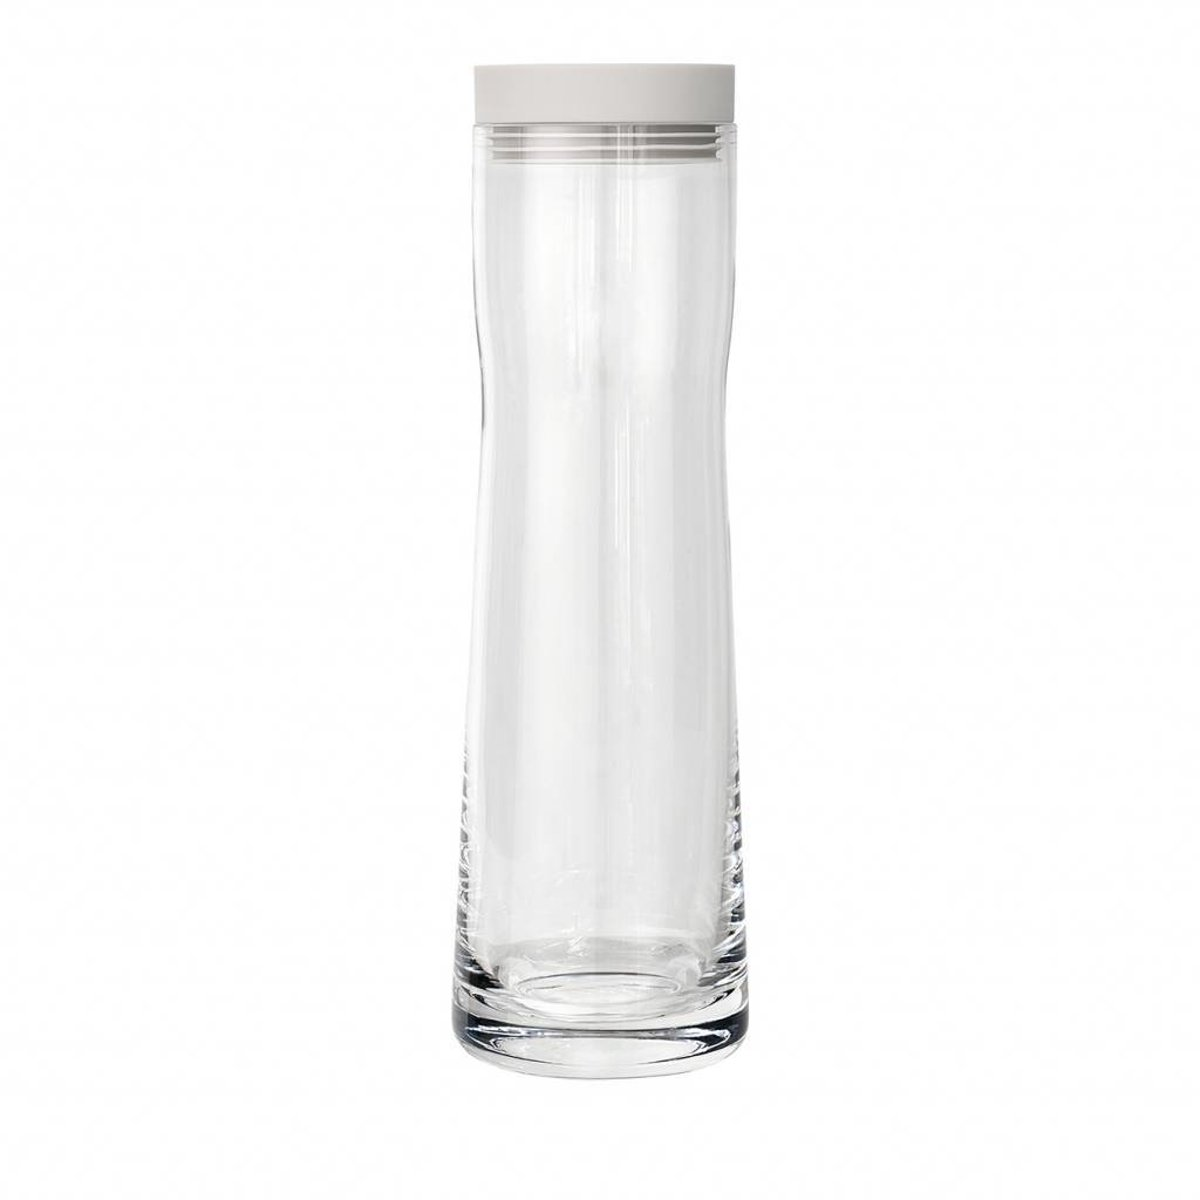 Blomus Splash Waterkaraf 1 Liter Moonbeam kopen